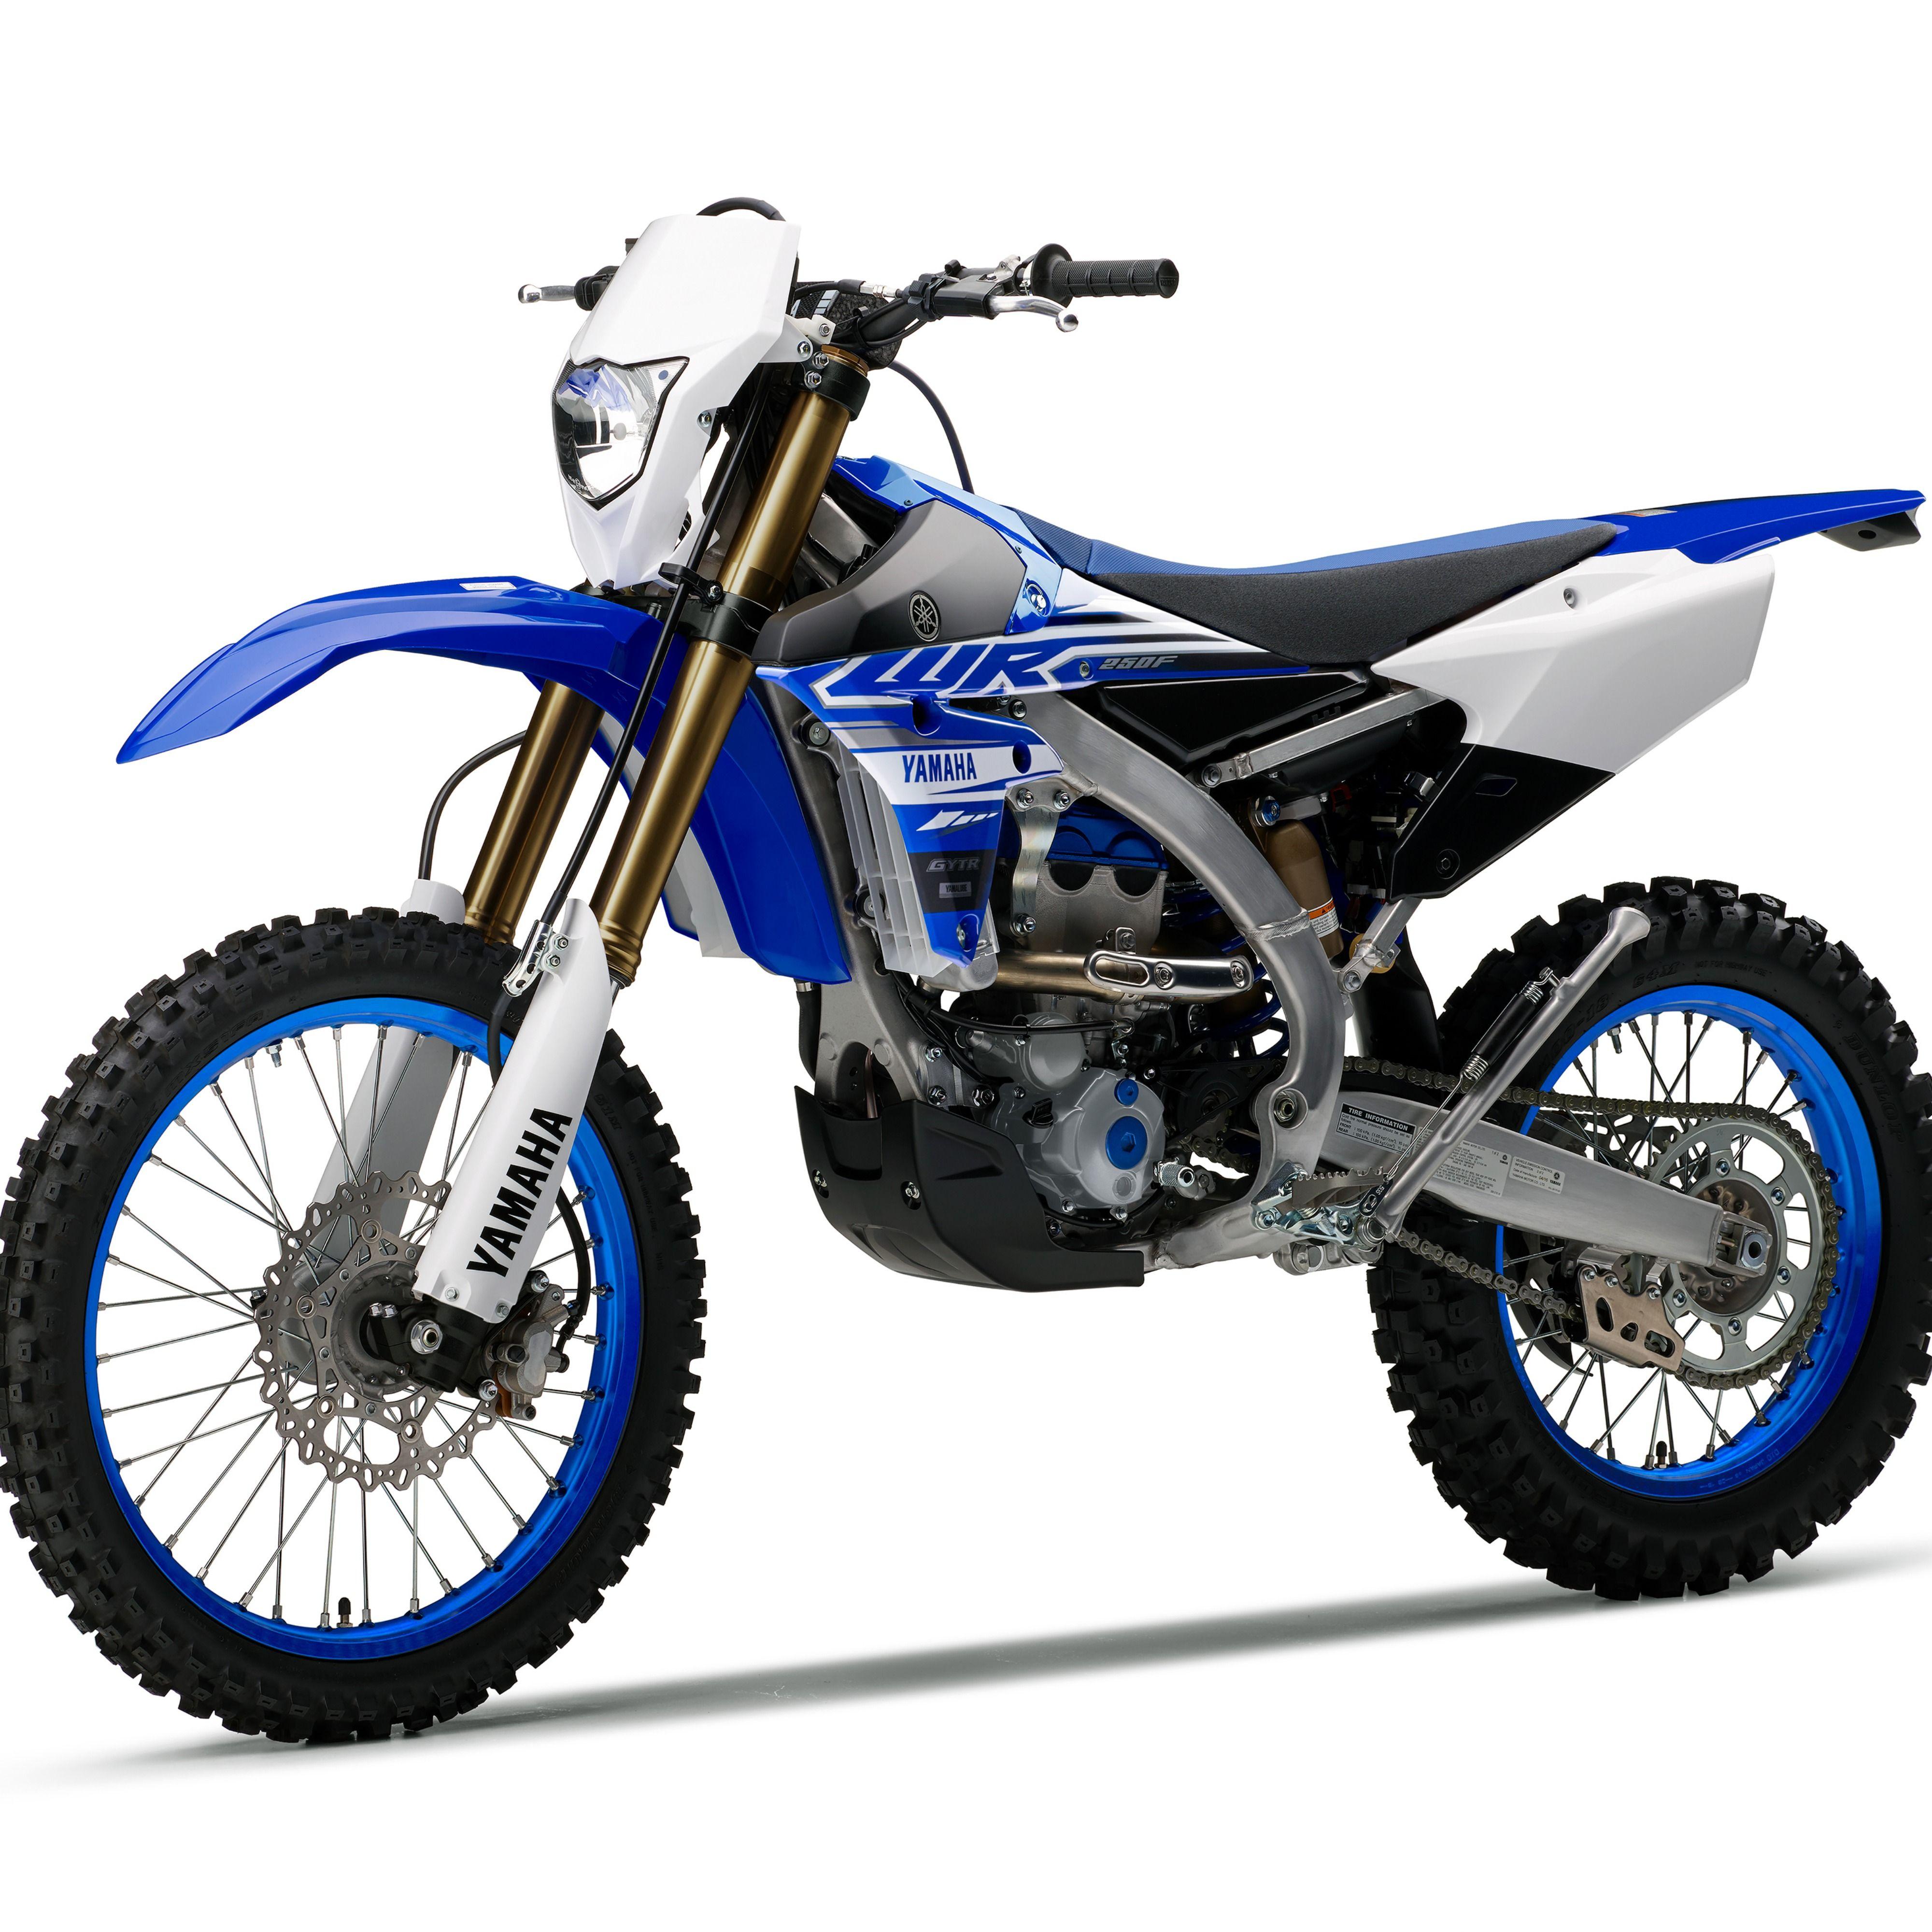 Yamaha Wr250f Yamaha Dirt Bikes Dirtbikes Yamaha